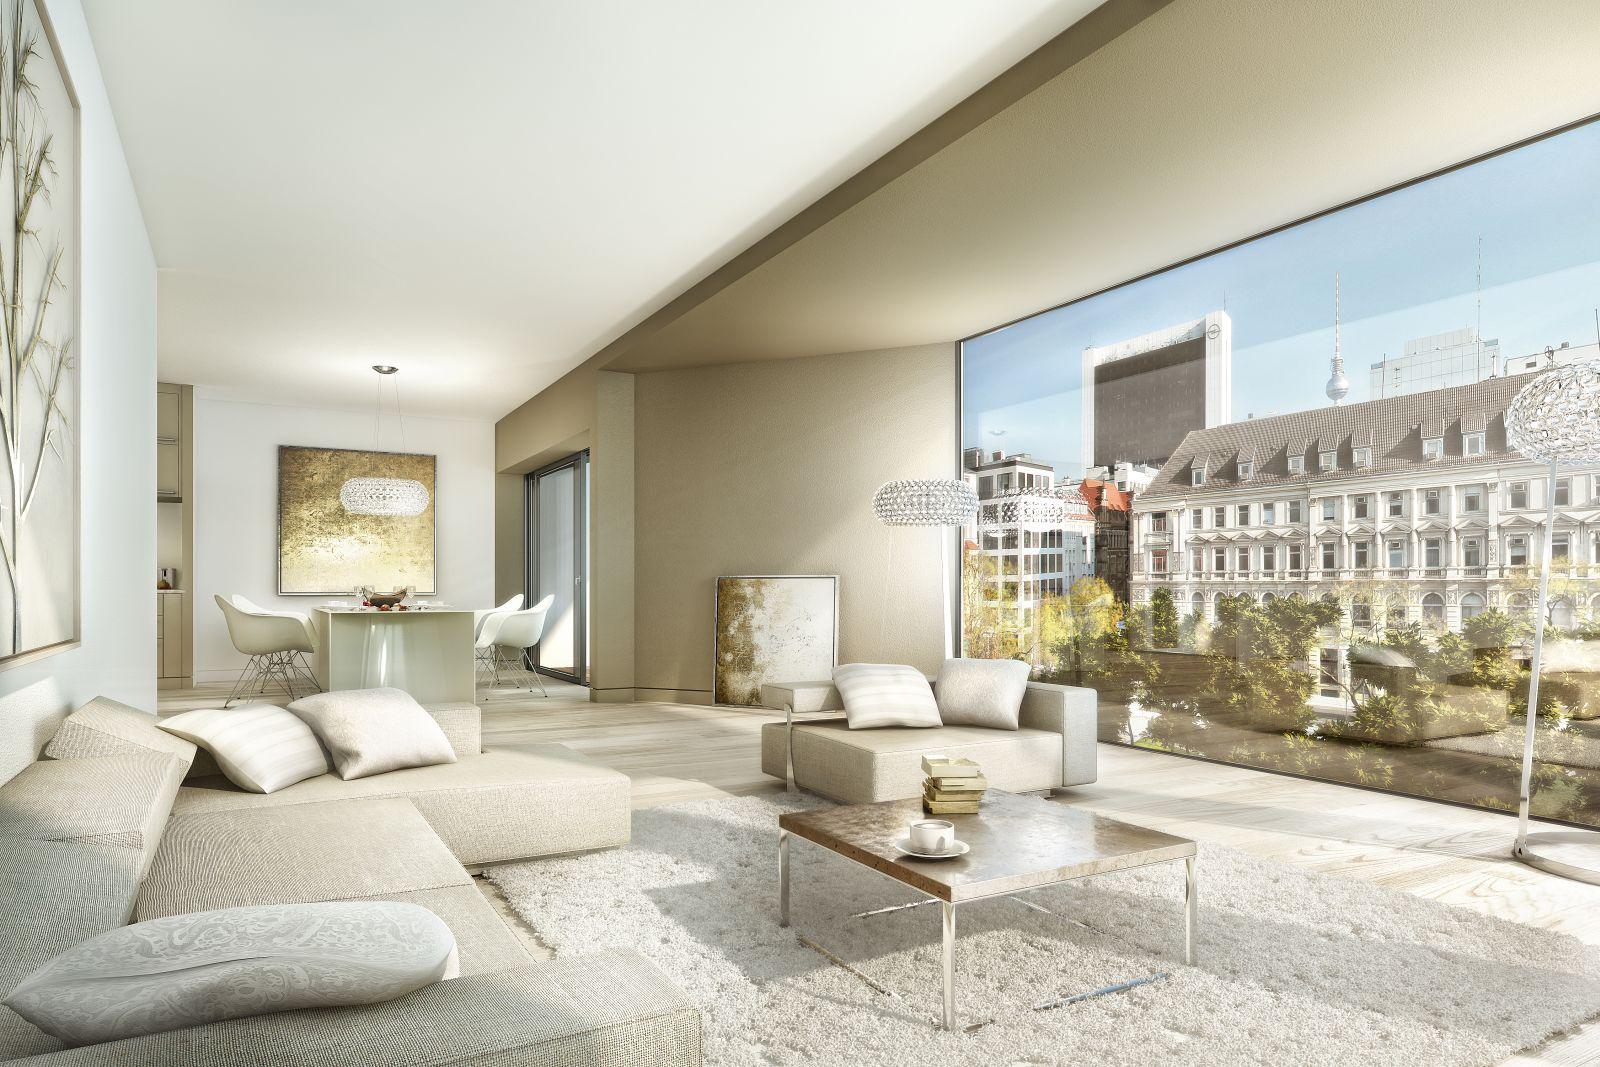 lux berlin mitte ziegert bank und immobilienconsulting gmbh archlab lindenkreuz eggert. Black Bedroom Furniture Sets. Home Design Ideas